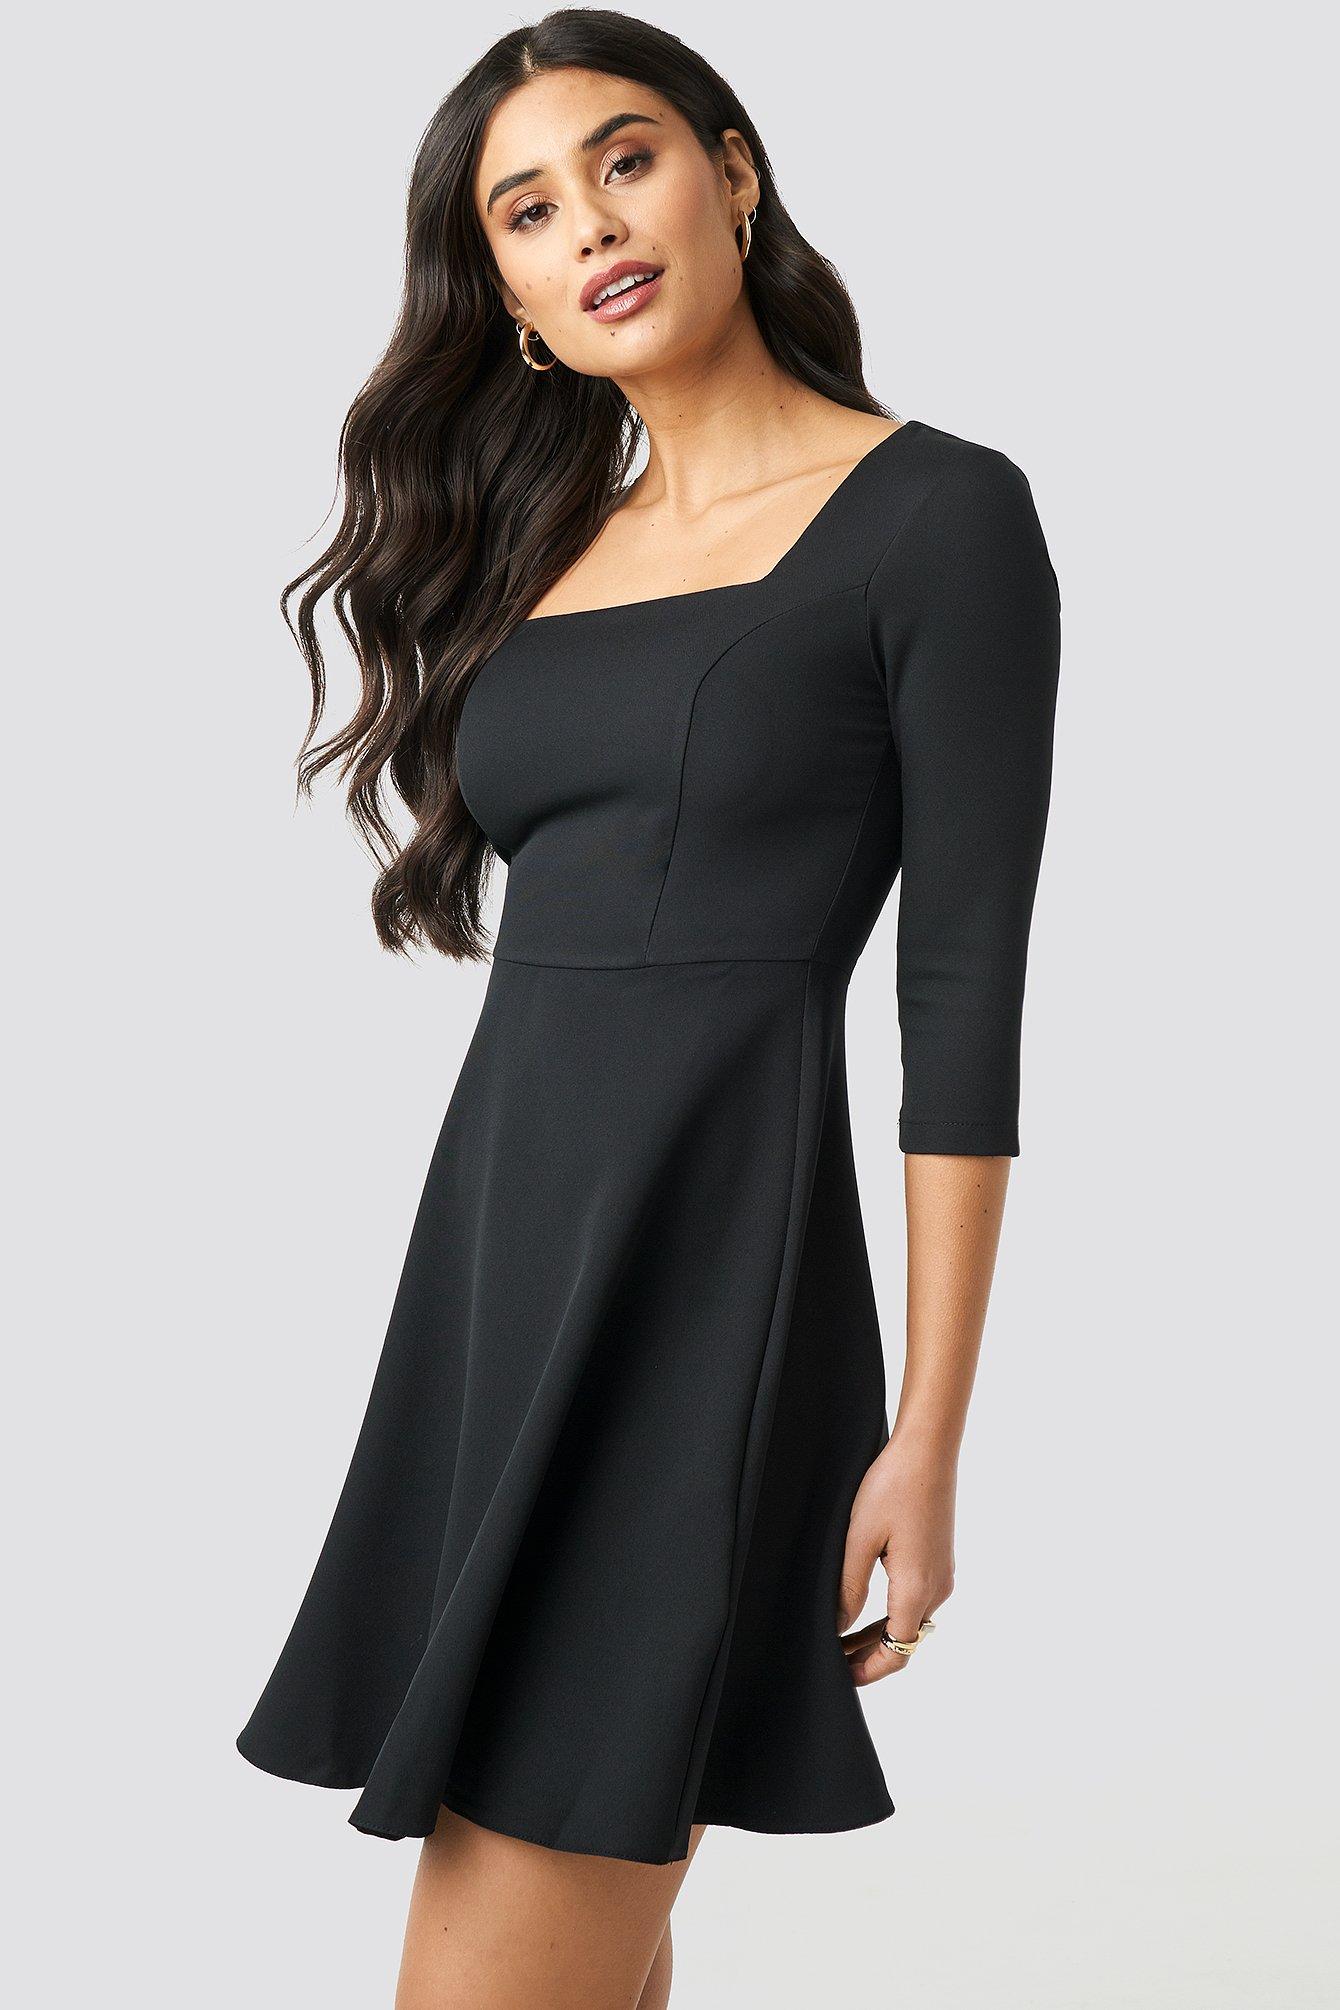 Square Collar Dress